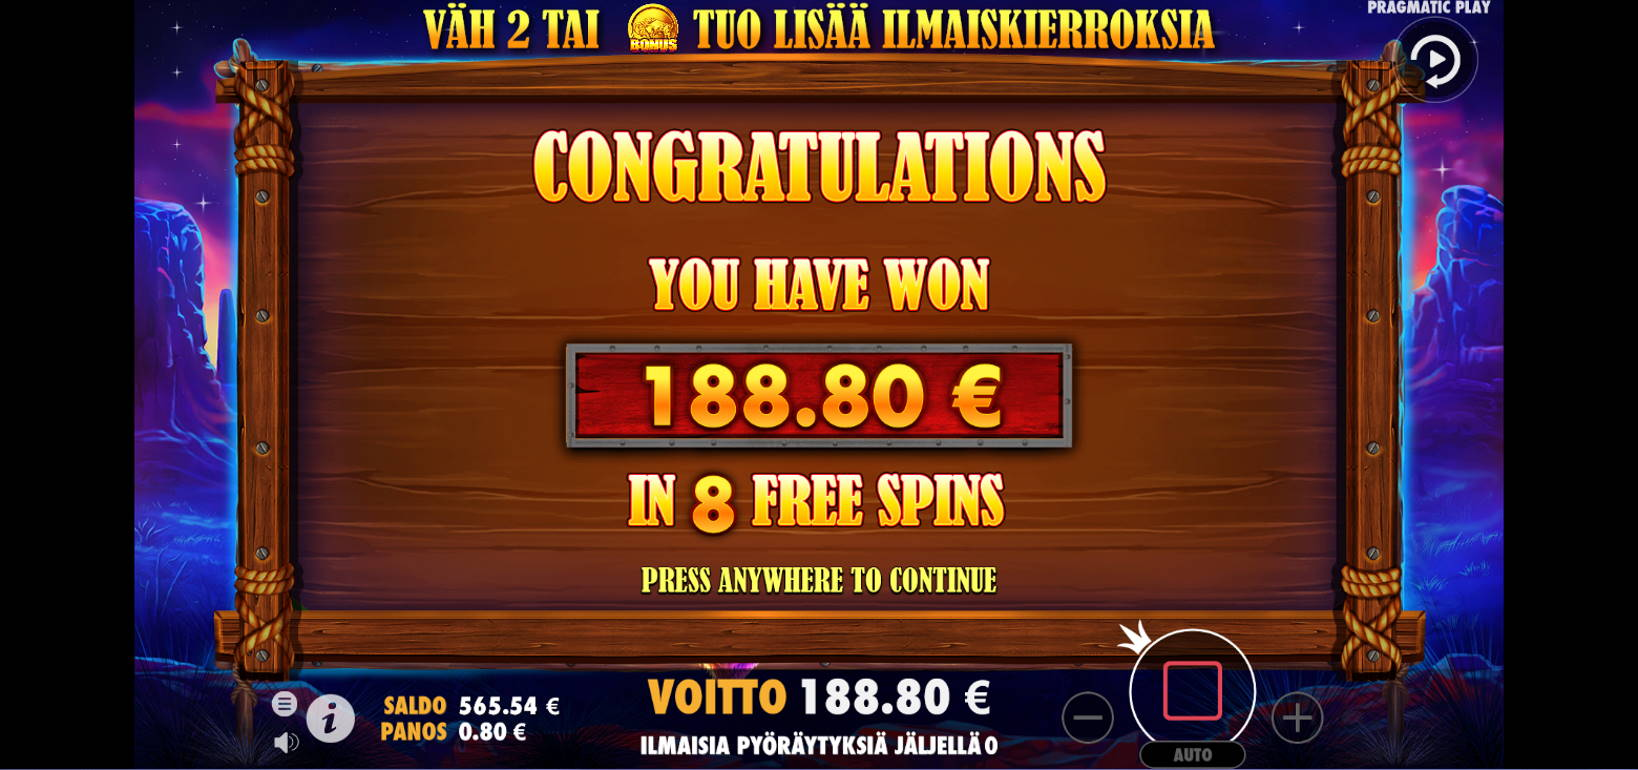 Buffalo King Casino win picture by Kari Grandi 20.8.2021 188.80e 236X